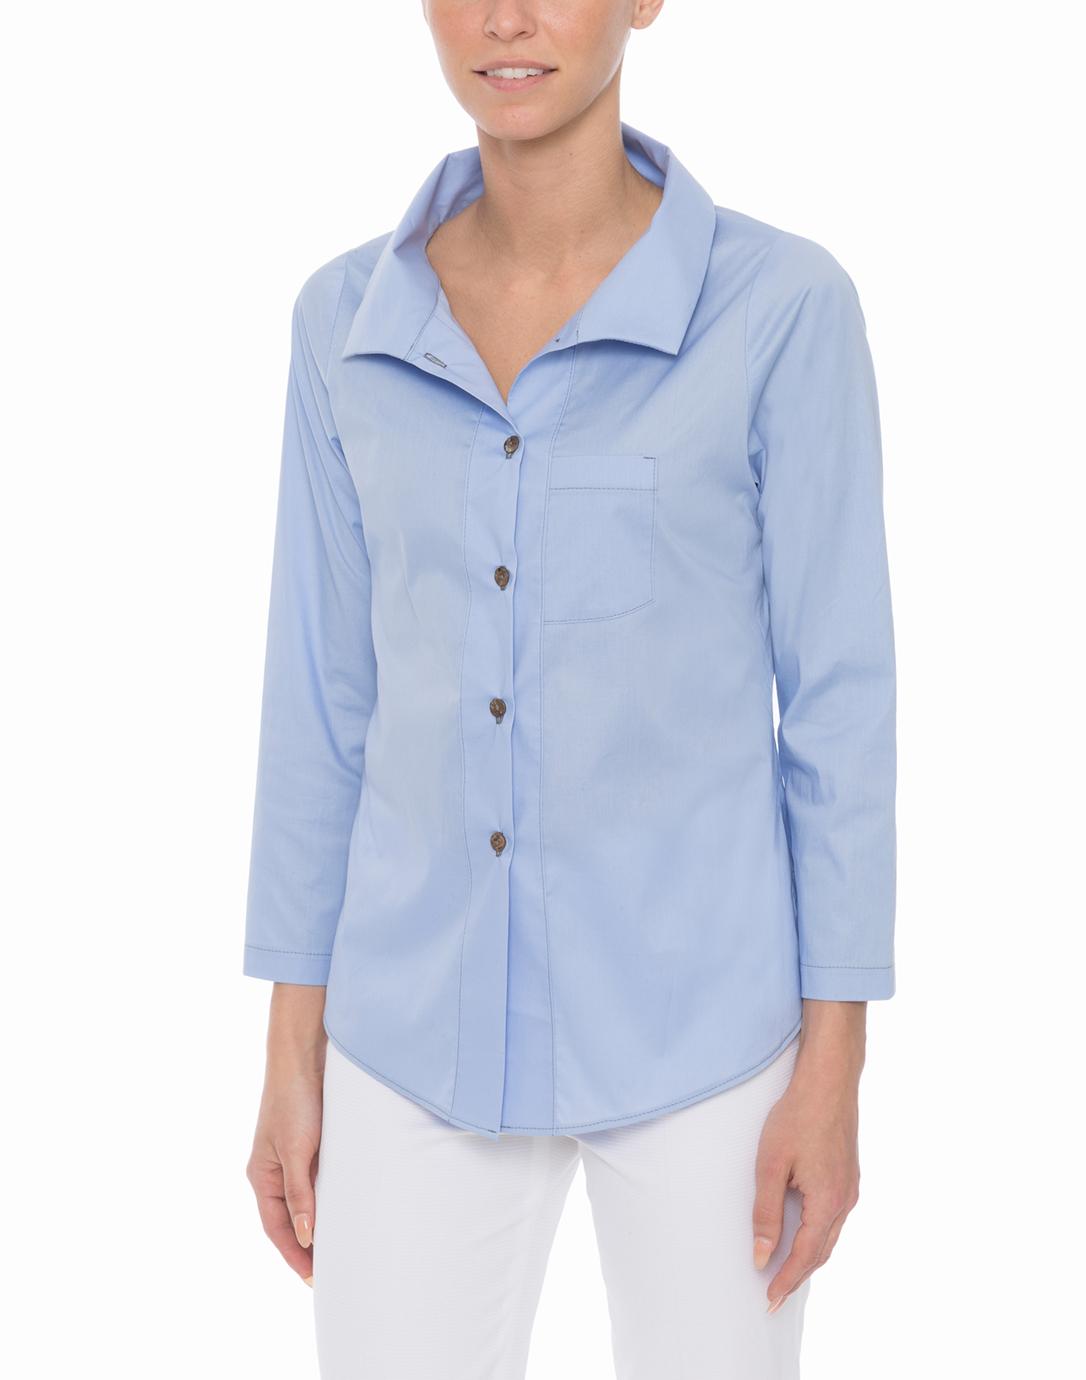 French blue stretch cotton poplin shirt vitamin shirts for What is a poplin shirt